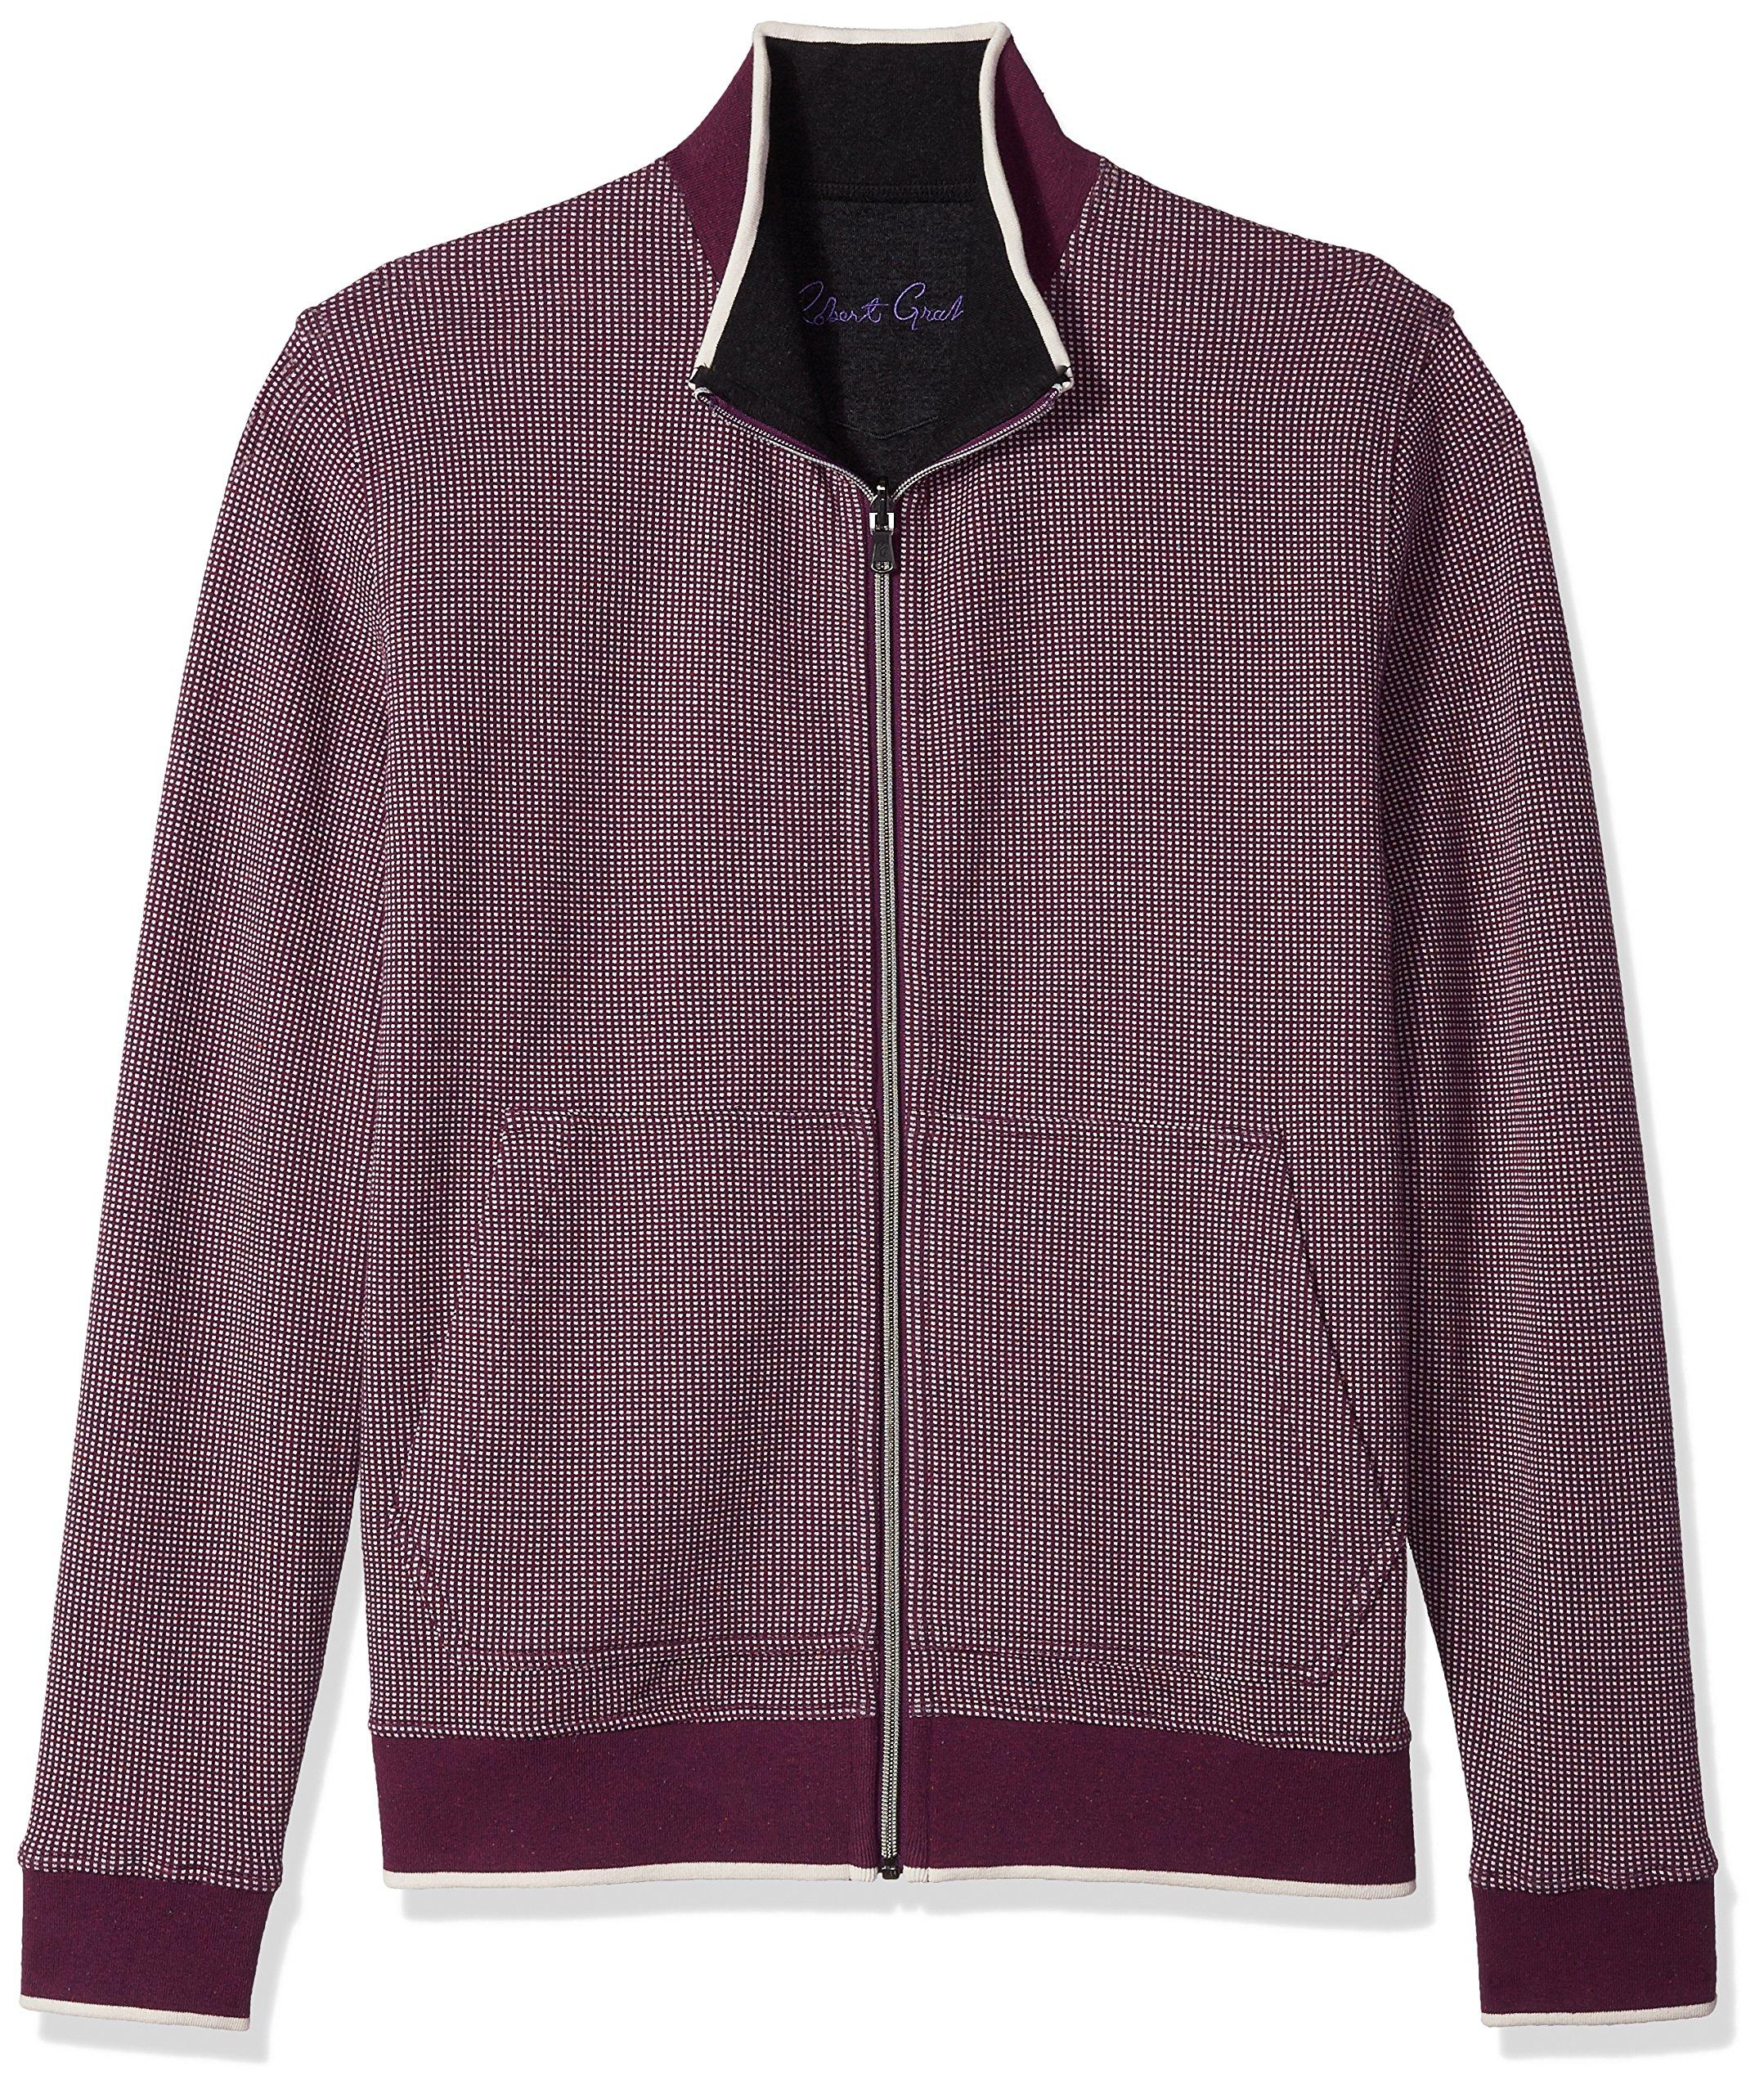 Robert Graham Men's Rivers Cotton Reversible Full Zip Knit, Purple, XLarge